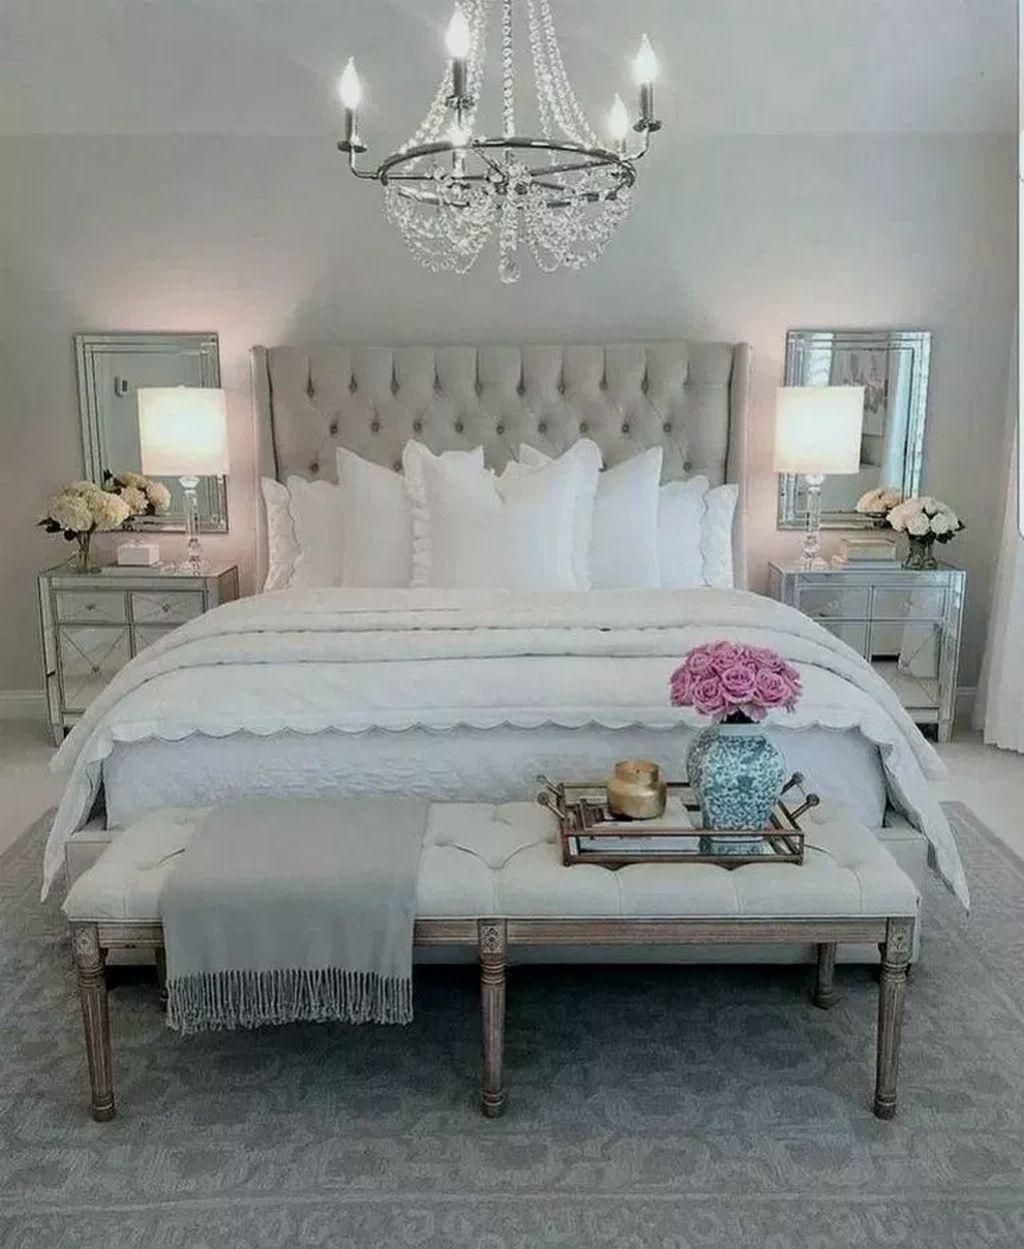 101 Elegant Small Master Bedroom Inspiration On A Budget Glam Bedroom Decor Luxury Bedroom Master Master Bedrooms Decor